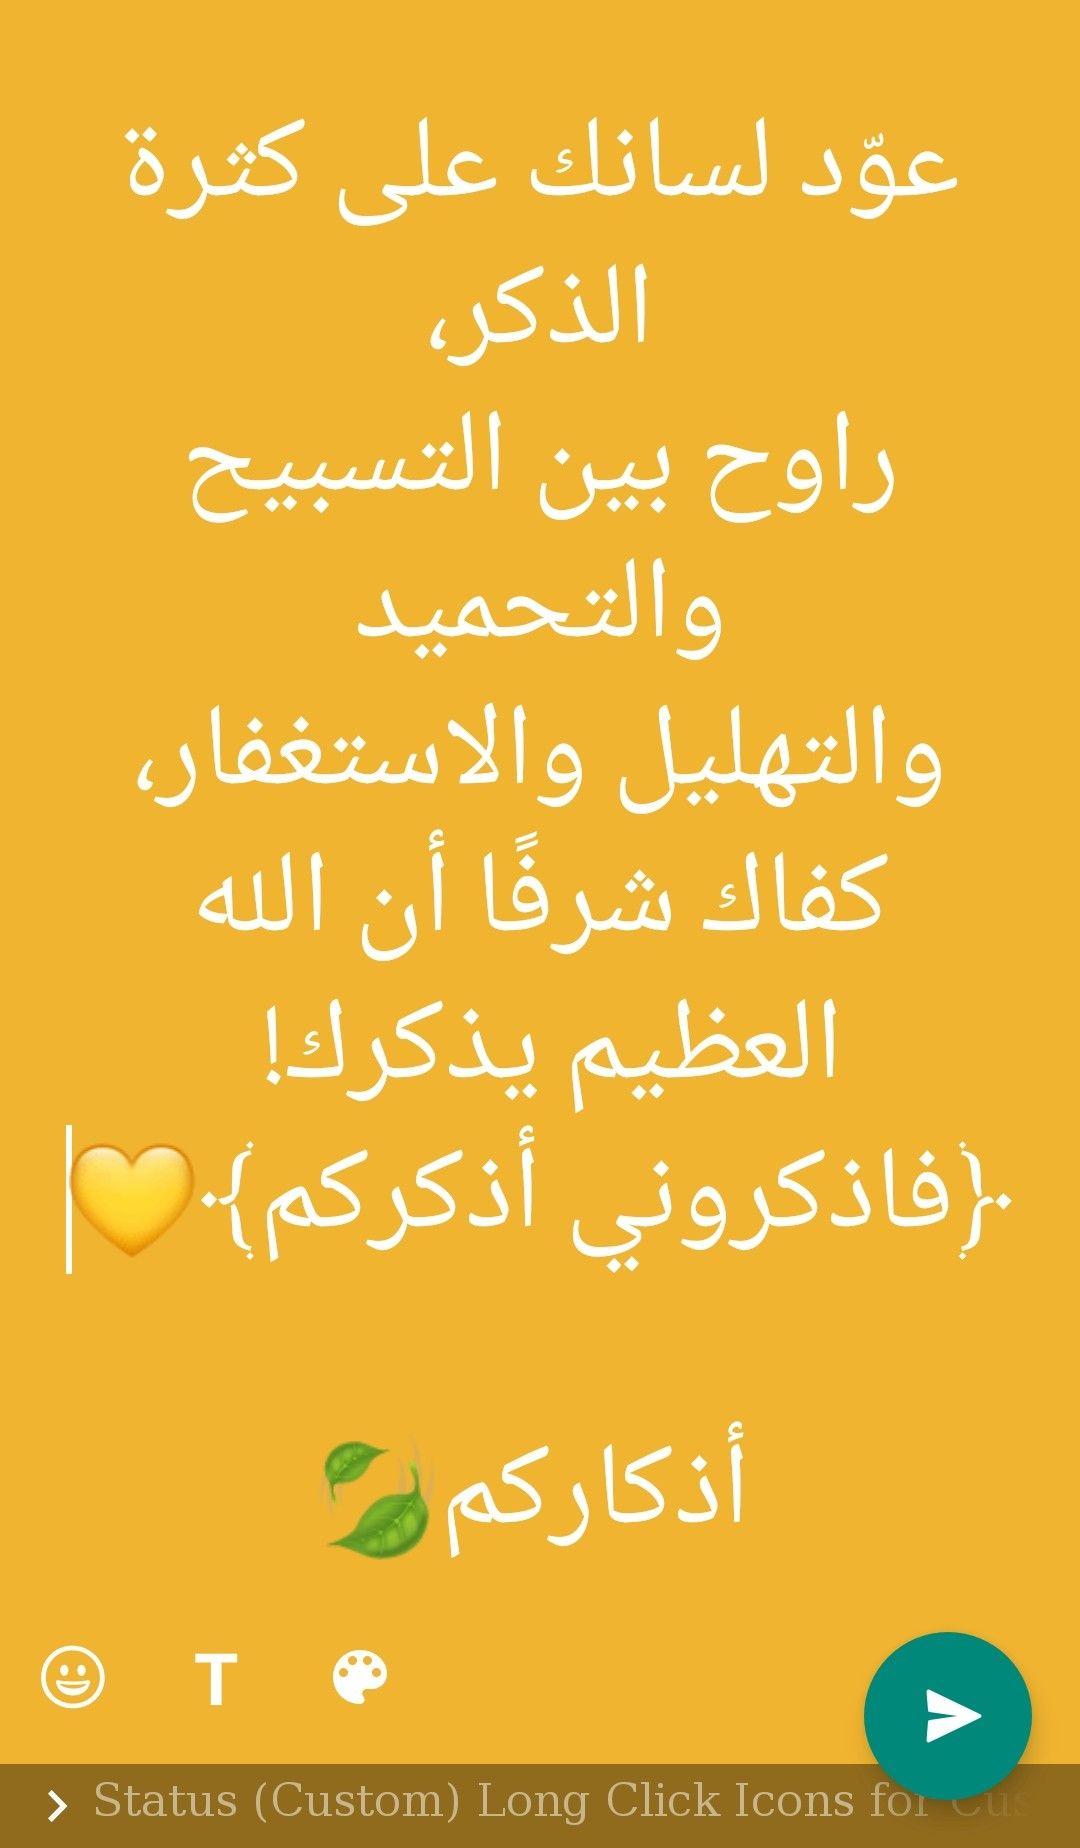 لا تنسى ابدا ذكر الله In 2020 Arabic Calligraphy Words Calligraphy